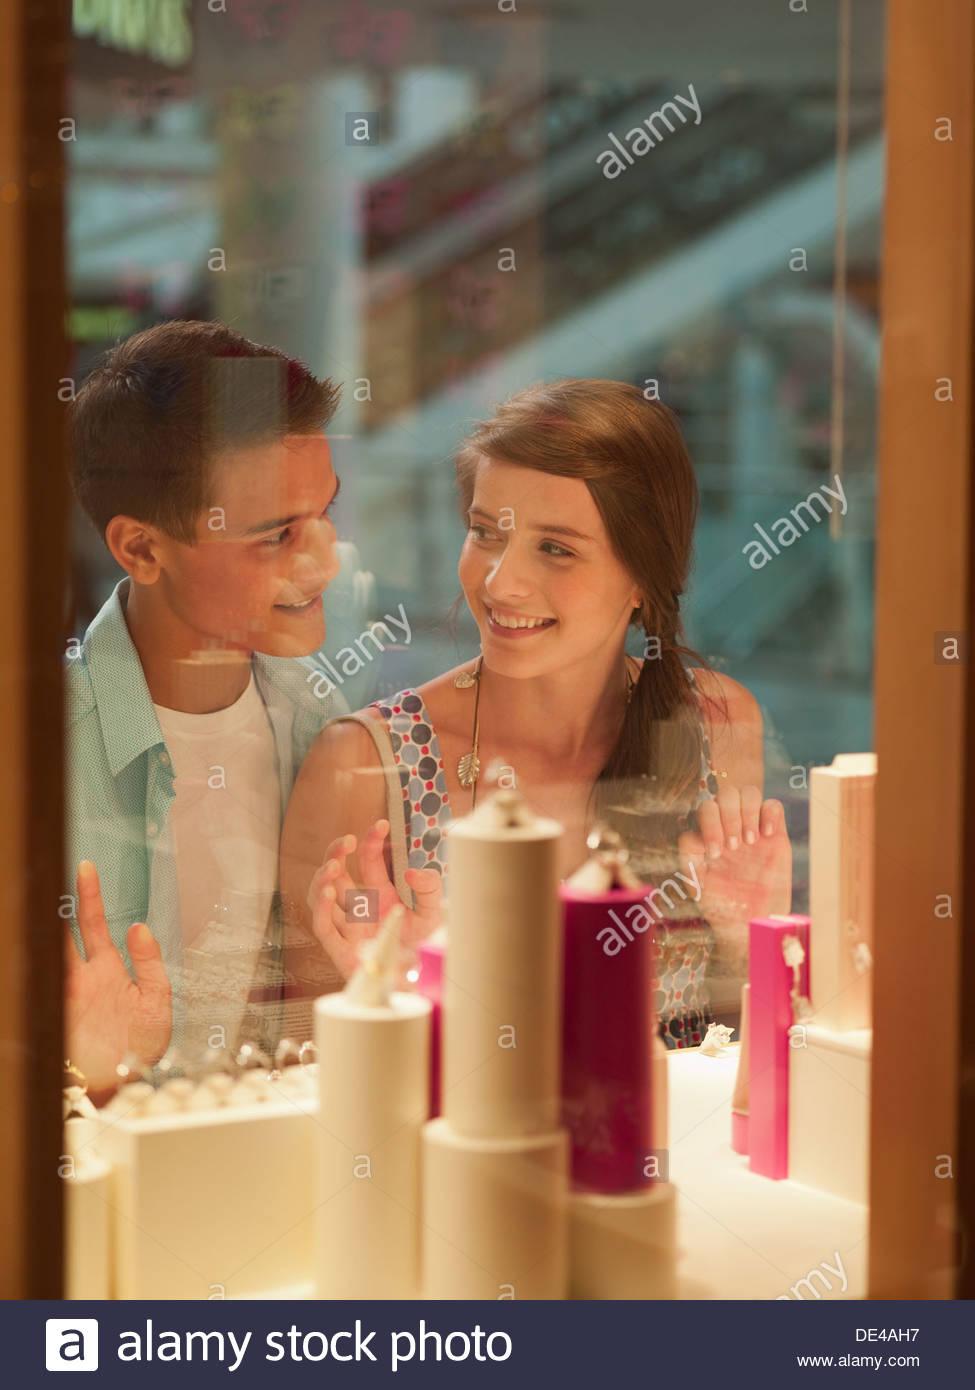 Sonriente Pareja mirando joyería en vitrina Imagen De Stock